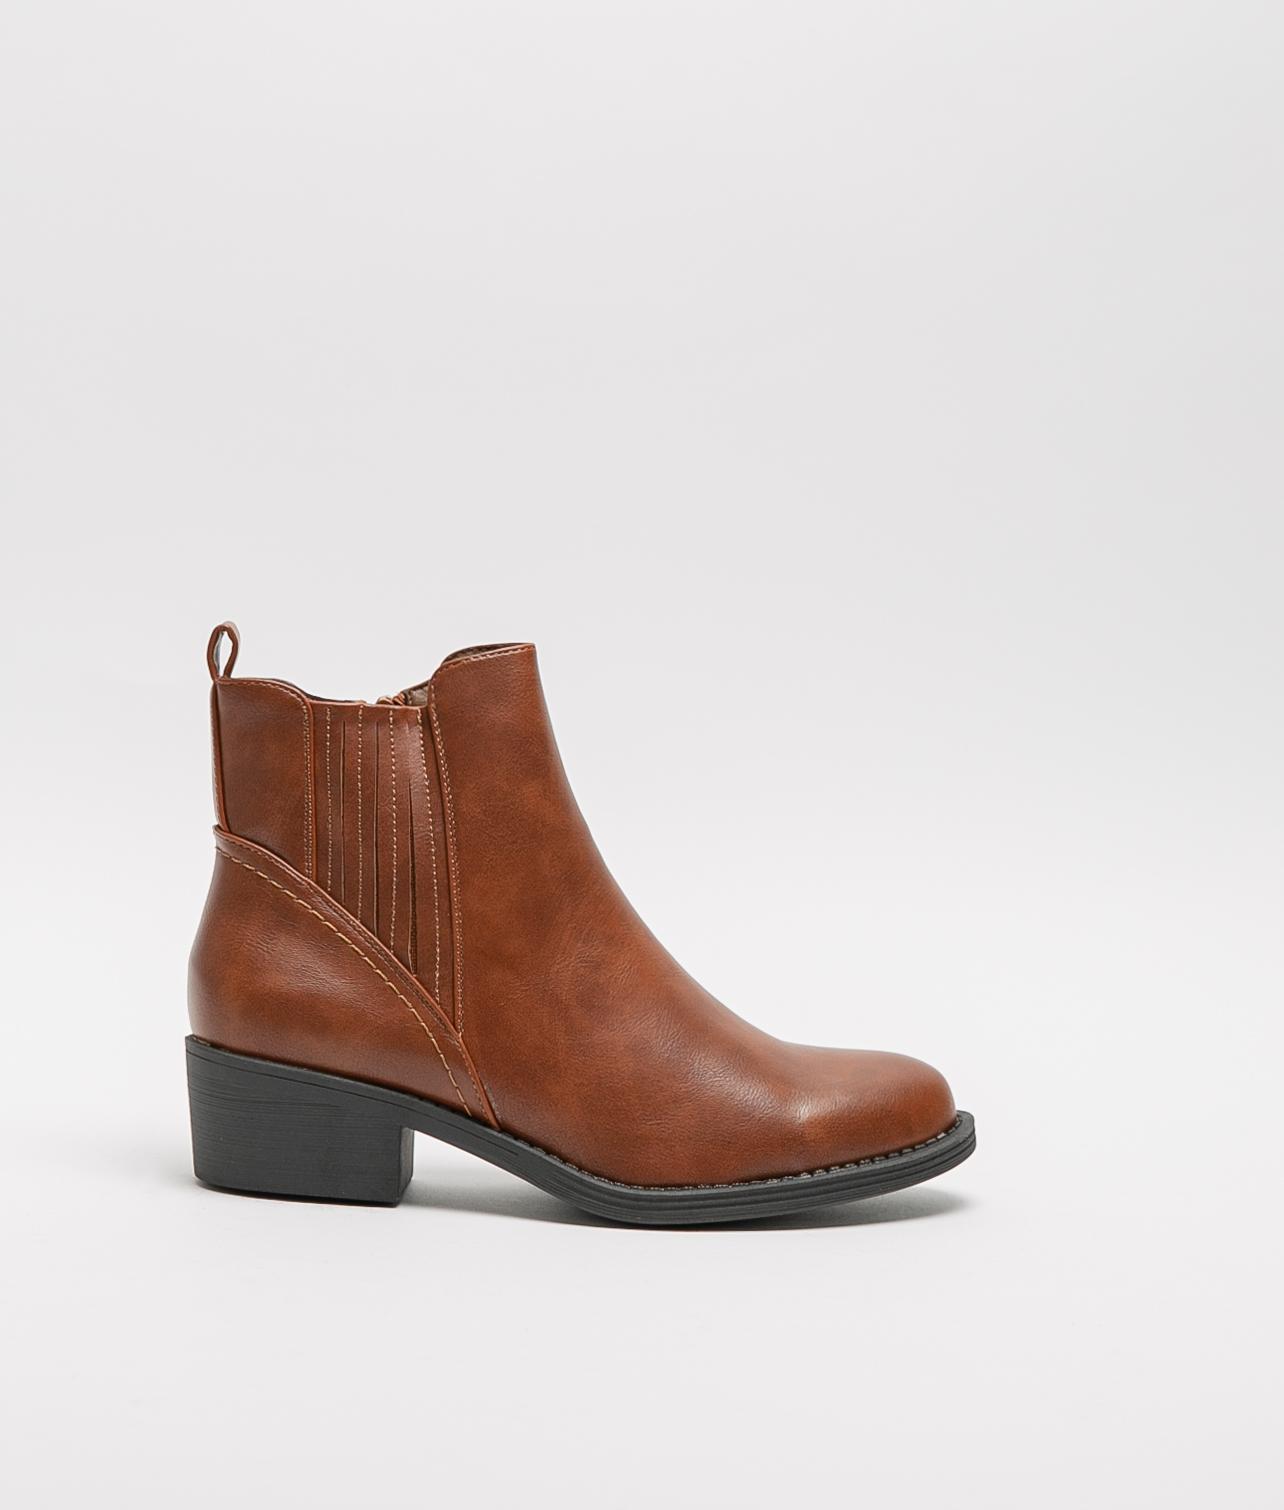 Low Boot Tilet - Camel